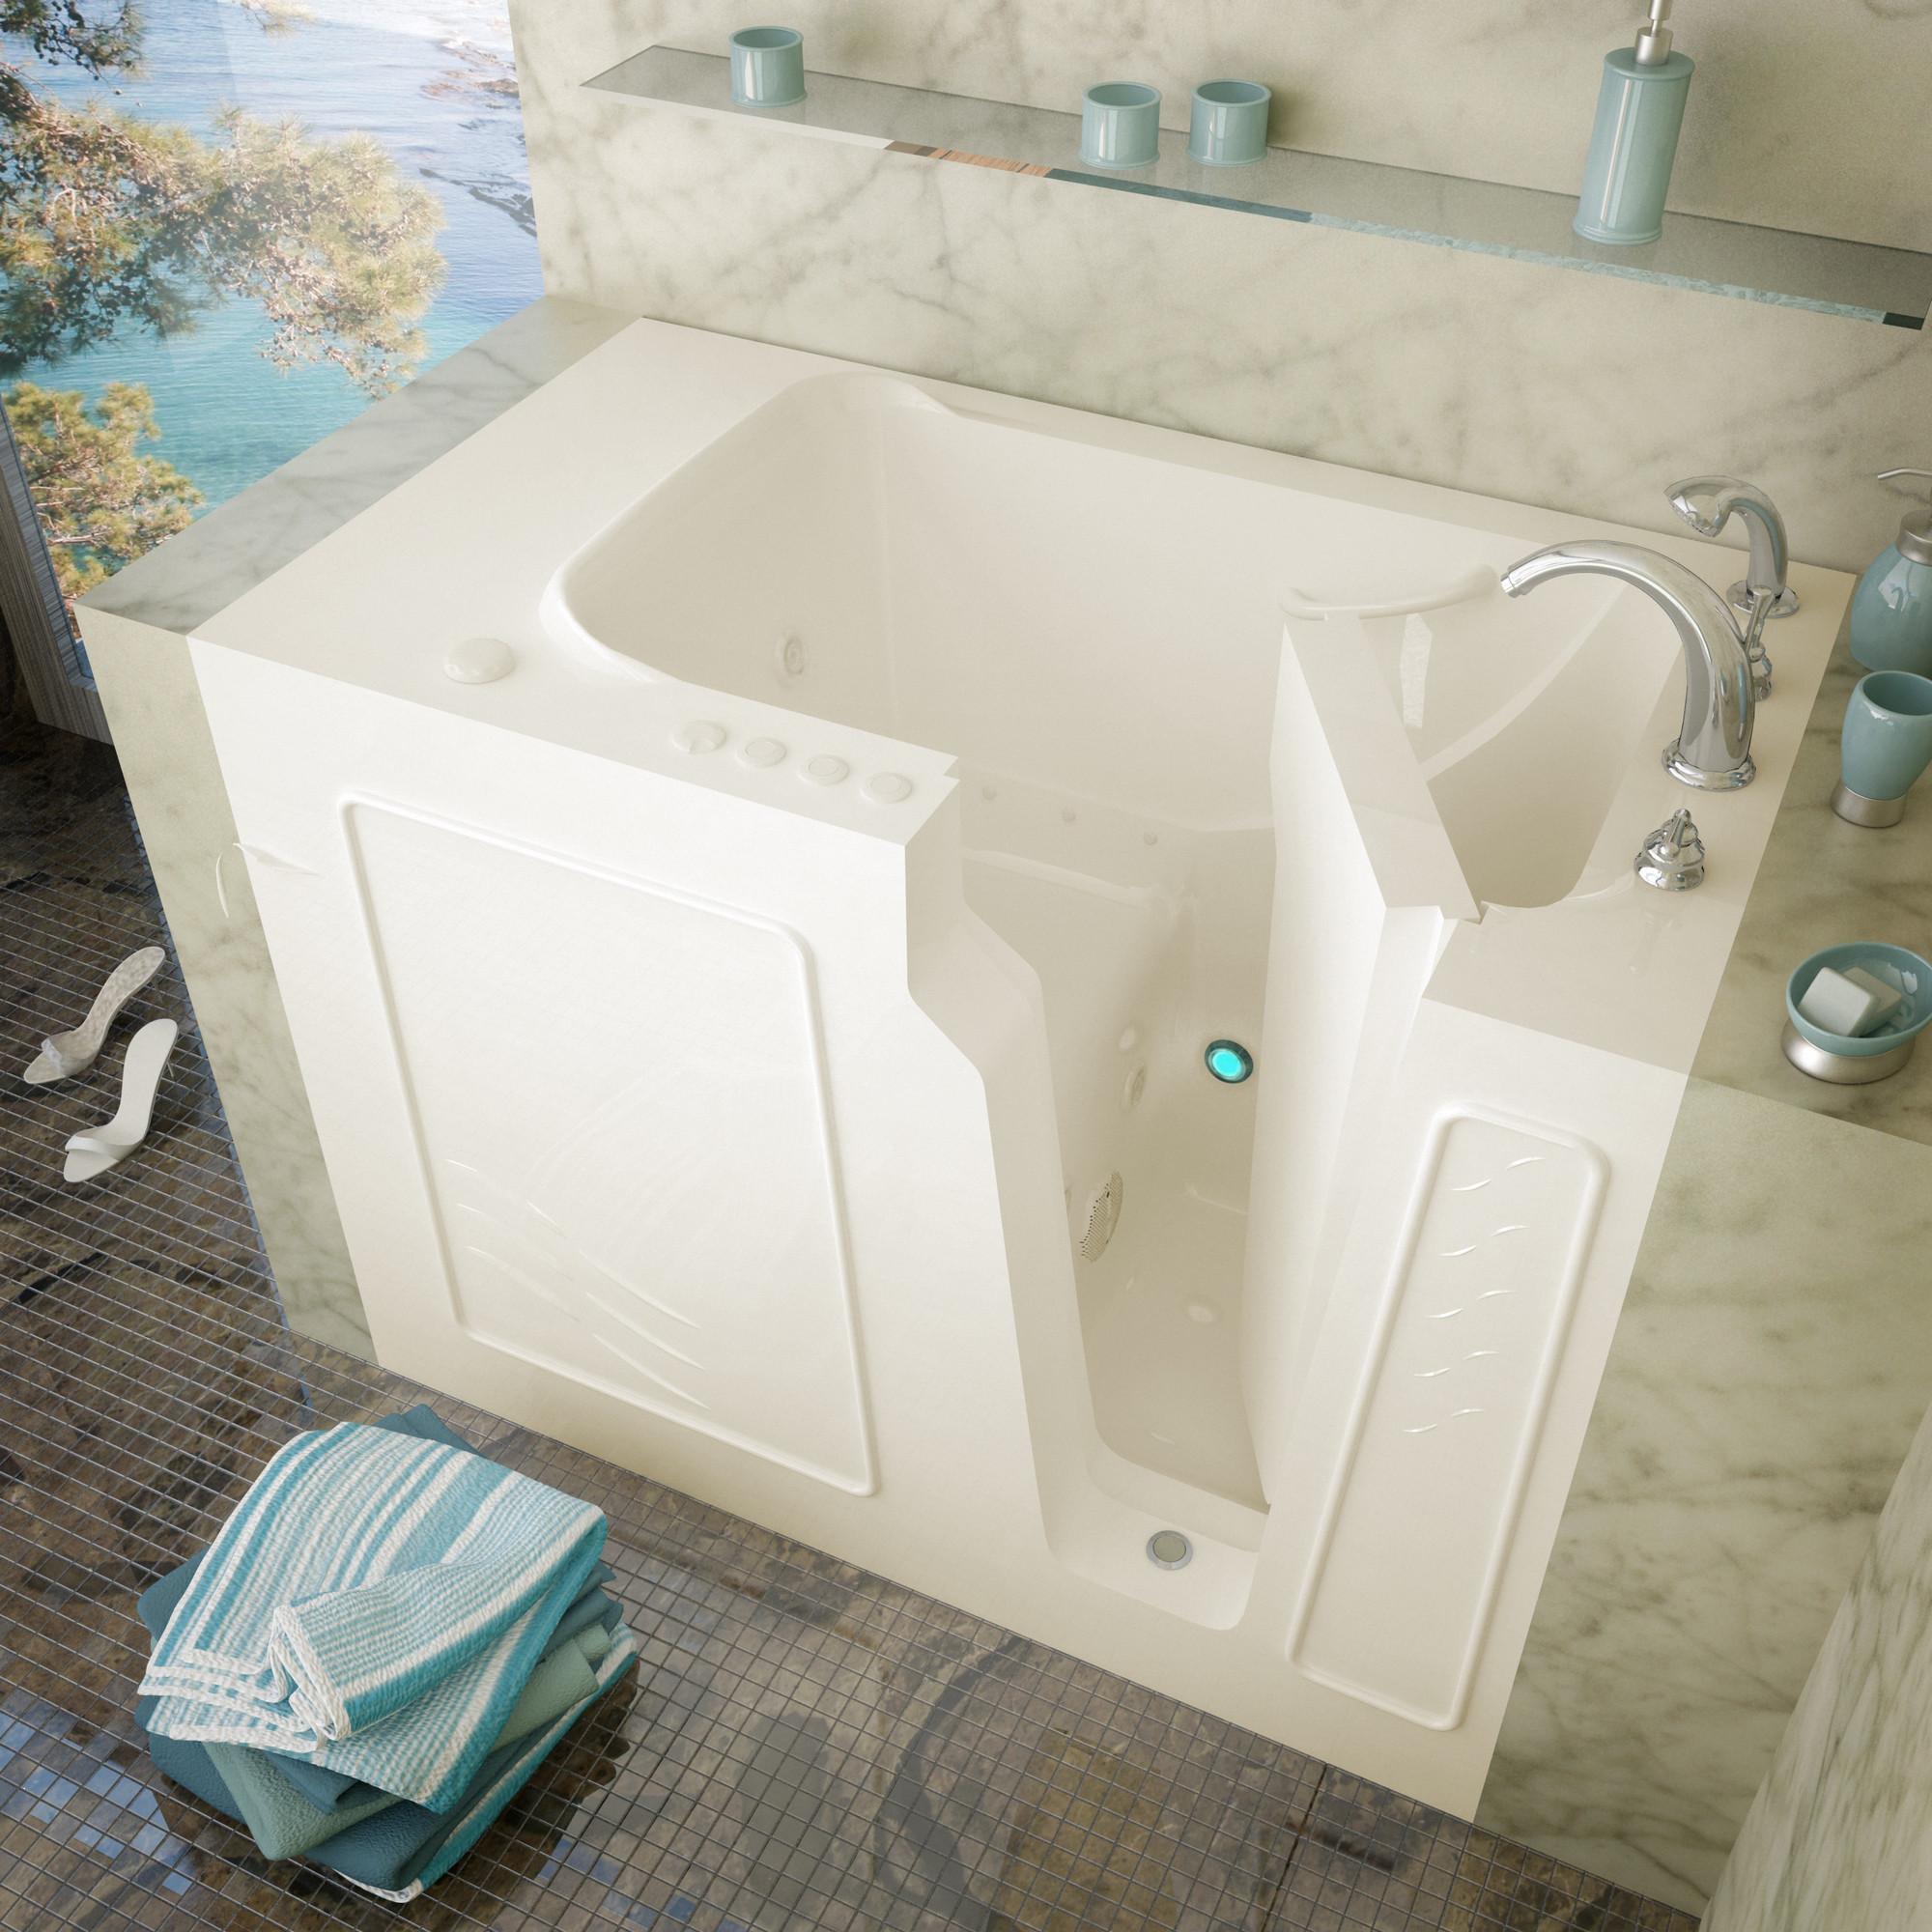 MediTub 2952LBD Walk-In Left Drain Biscuit Whirlpool & Air Jetted Bathtub